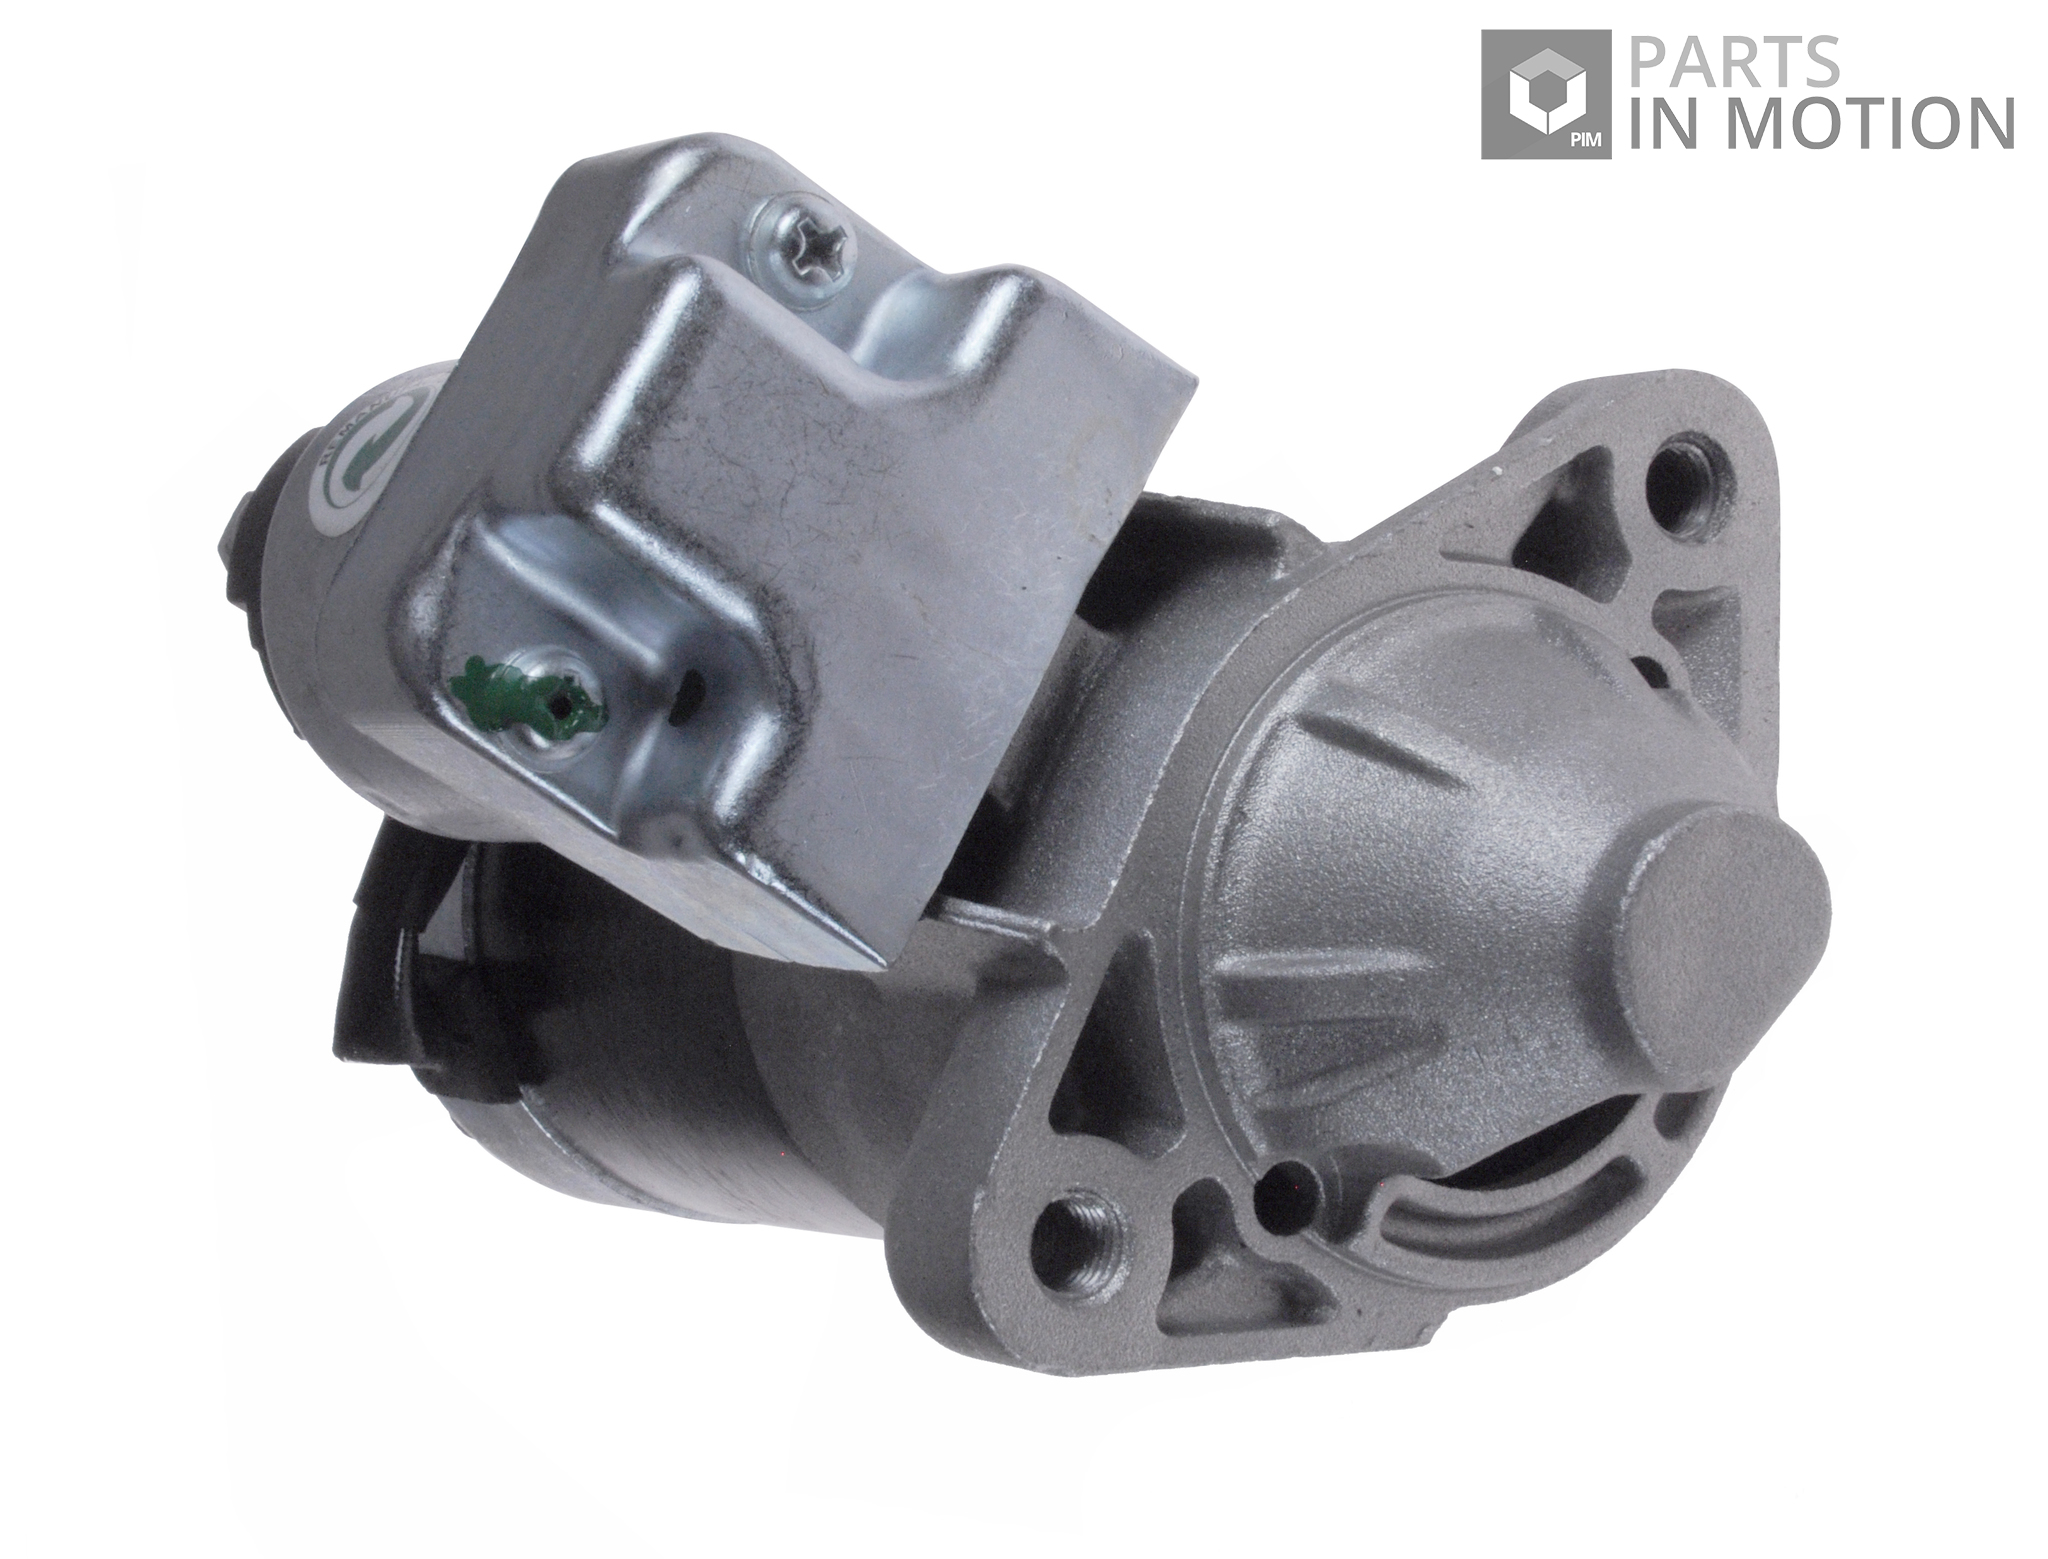 starter motor fits suzuki grand vitara mk1 2 0 98 to 05 j20a manual rh ebay ie manual de motor j20a suzuki manual de motor j20a suzuki